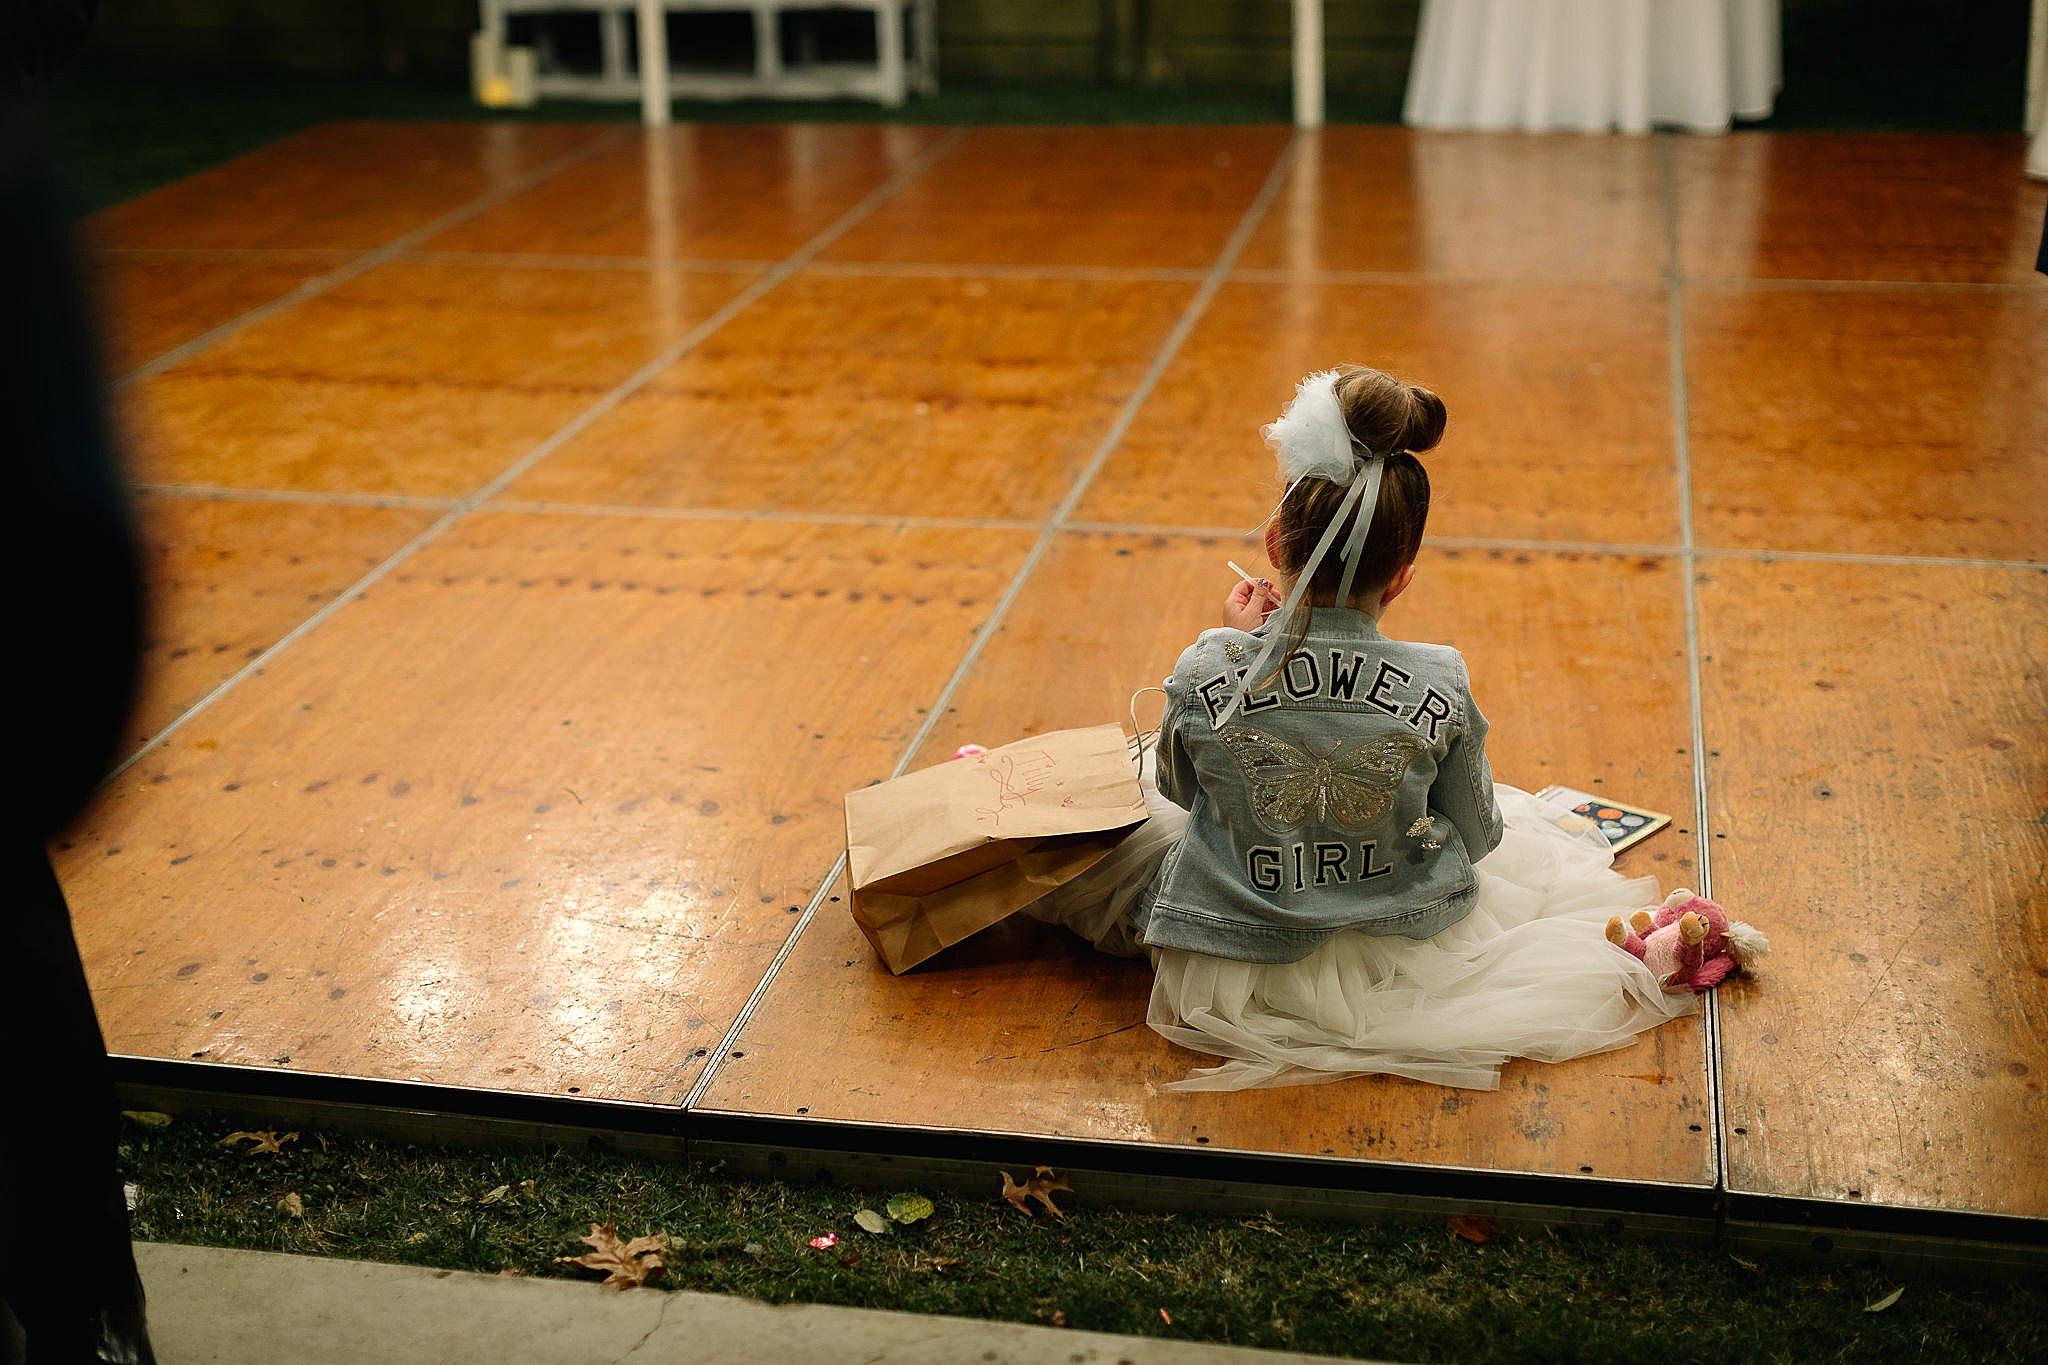 Keepsakephoto by the Keeffes,ACT wedding photographer,ACT weddings,Bowral Wedding Photographer,Southern Highlands Wedding,Canberra Wedding Photographer,Canberra Wedding Photography,canberra weddings,Southern Highlands,Moxom & Whitney,Canberra Photography,country wedding,